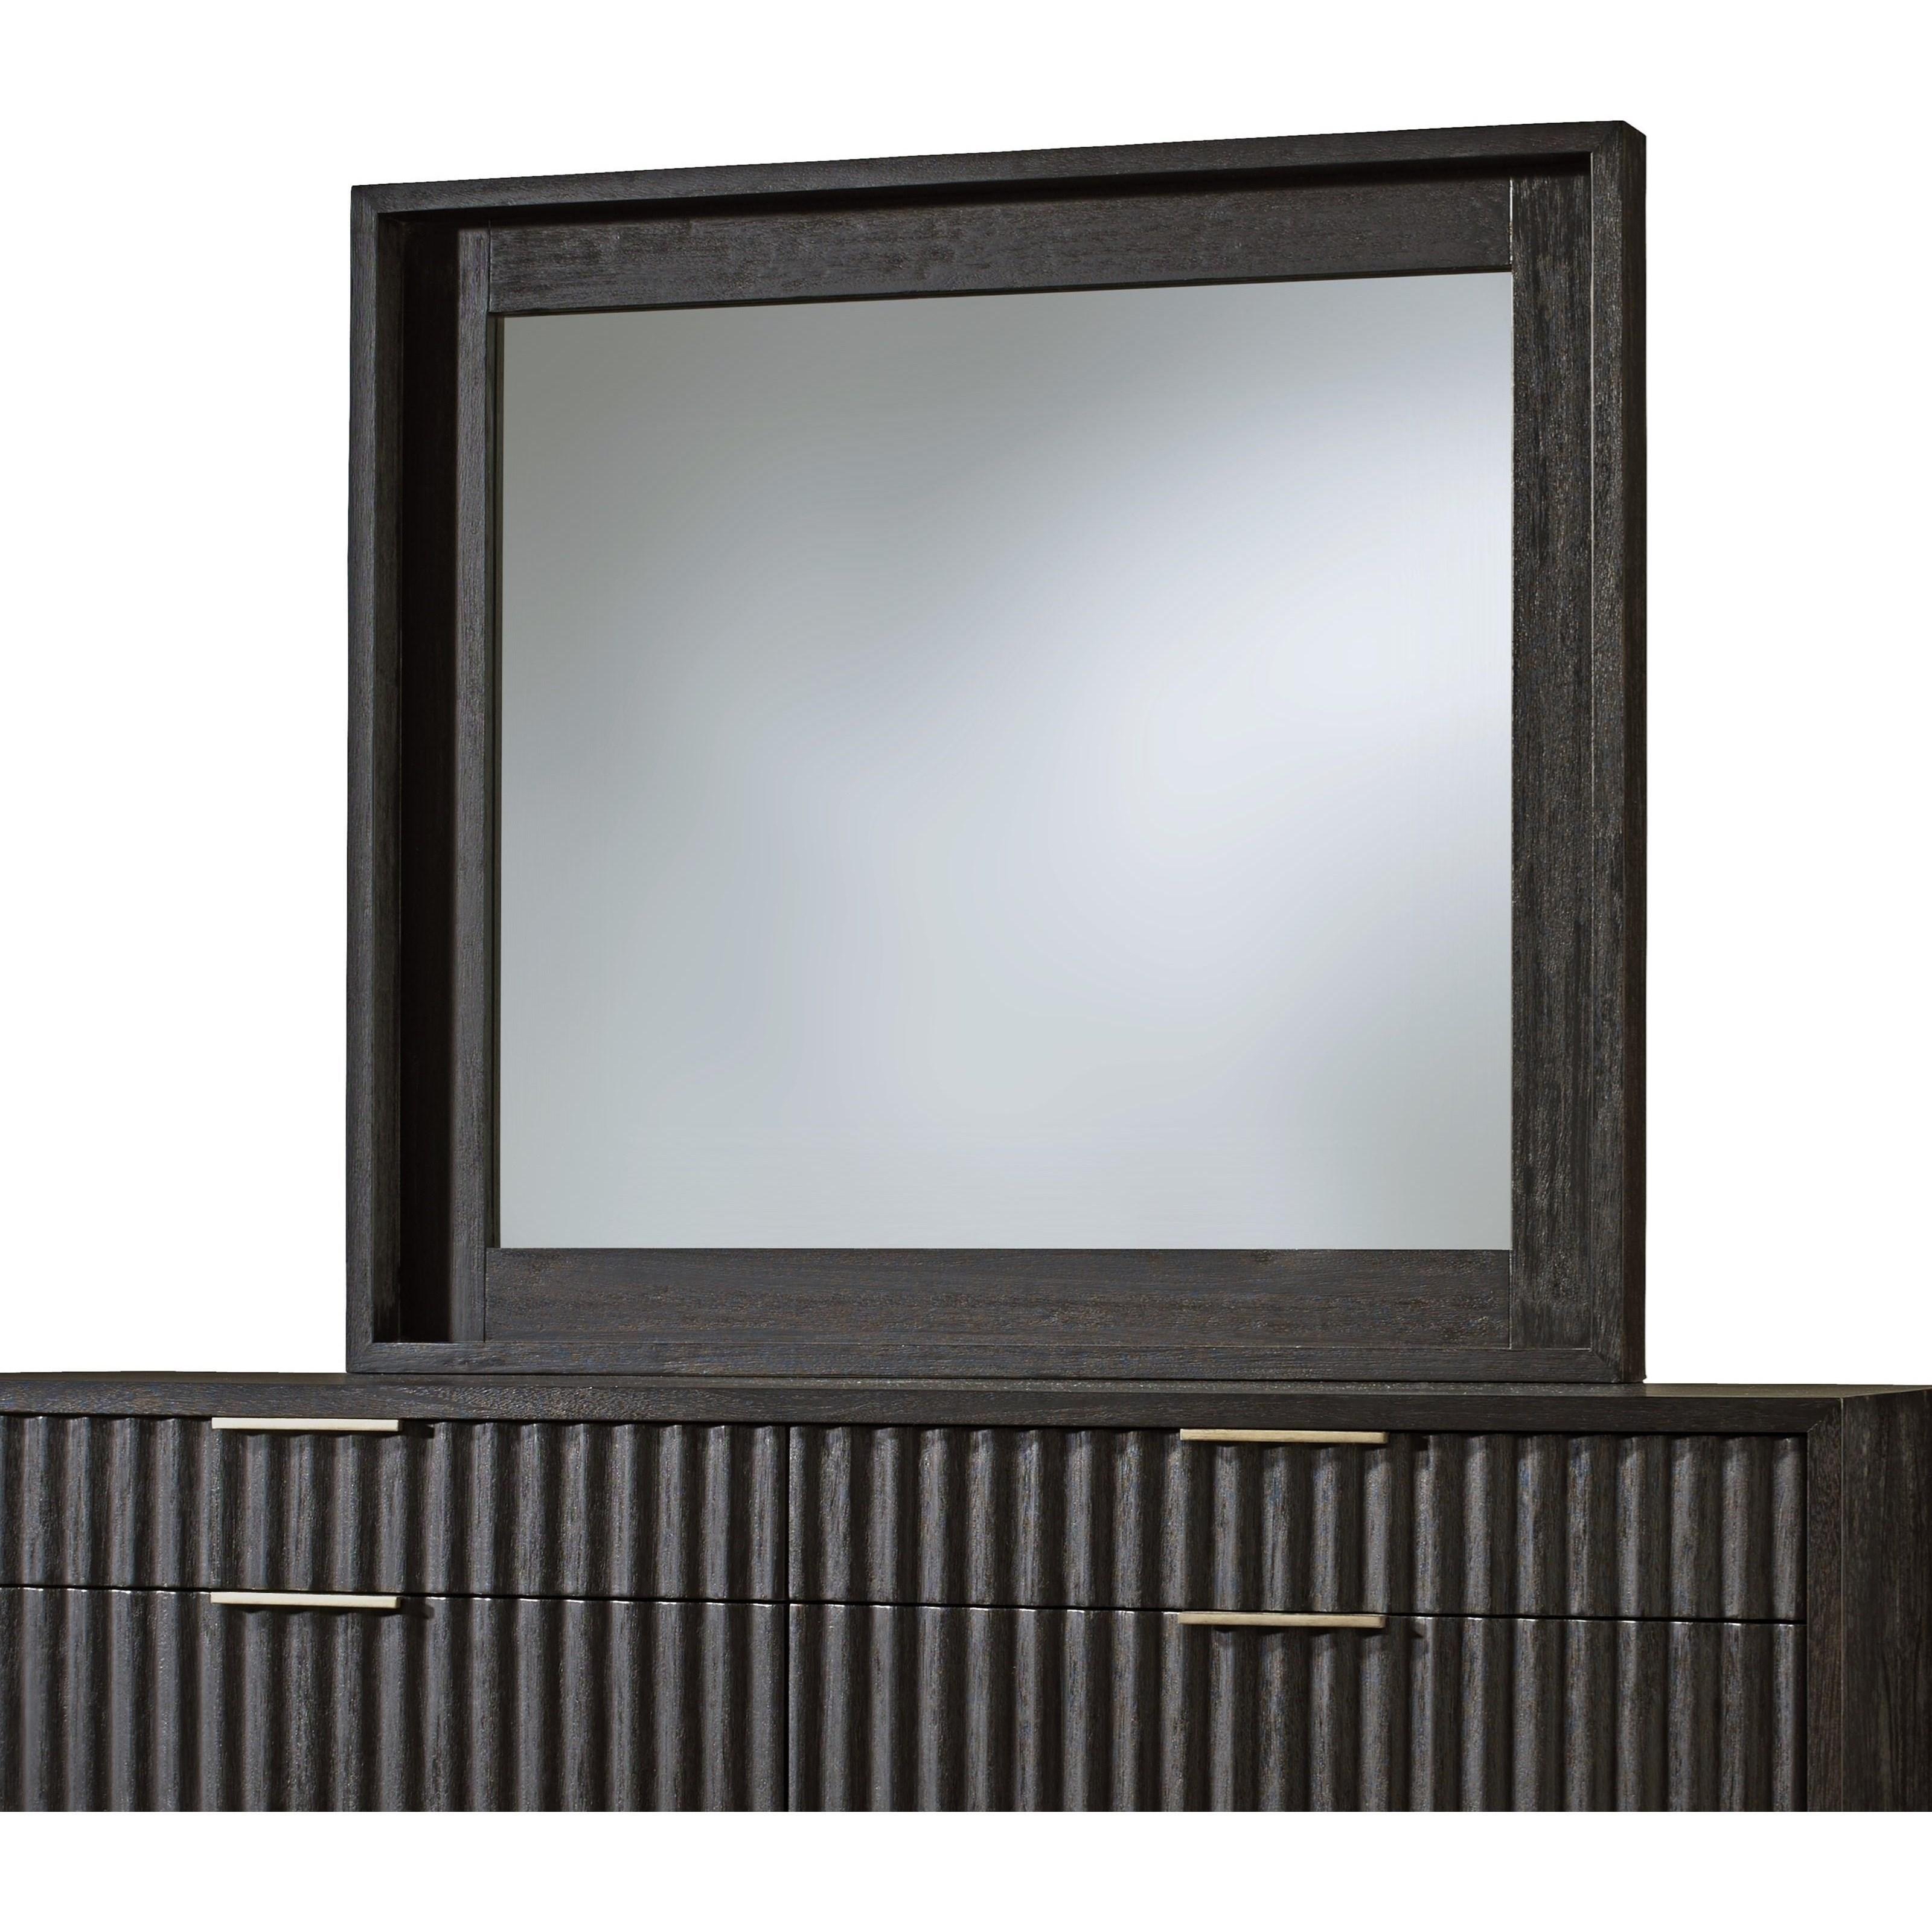 Kentfield Mirror by Modus International at HomeWorld Furniture